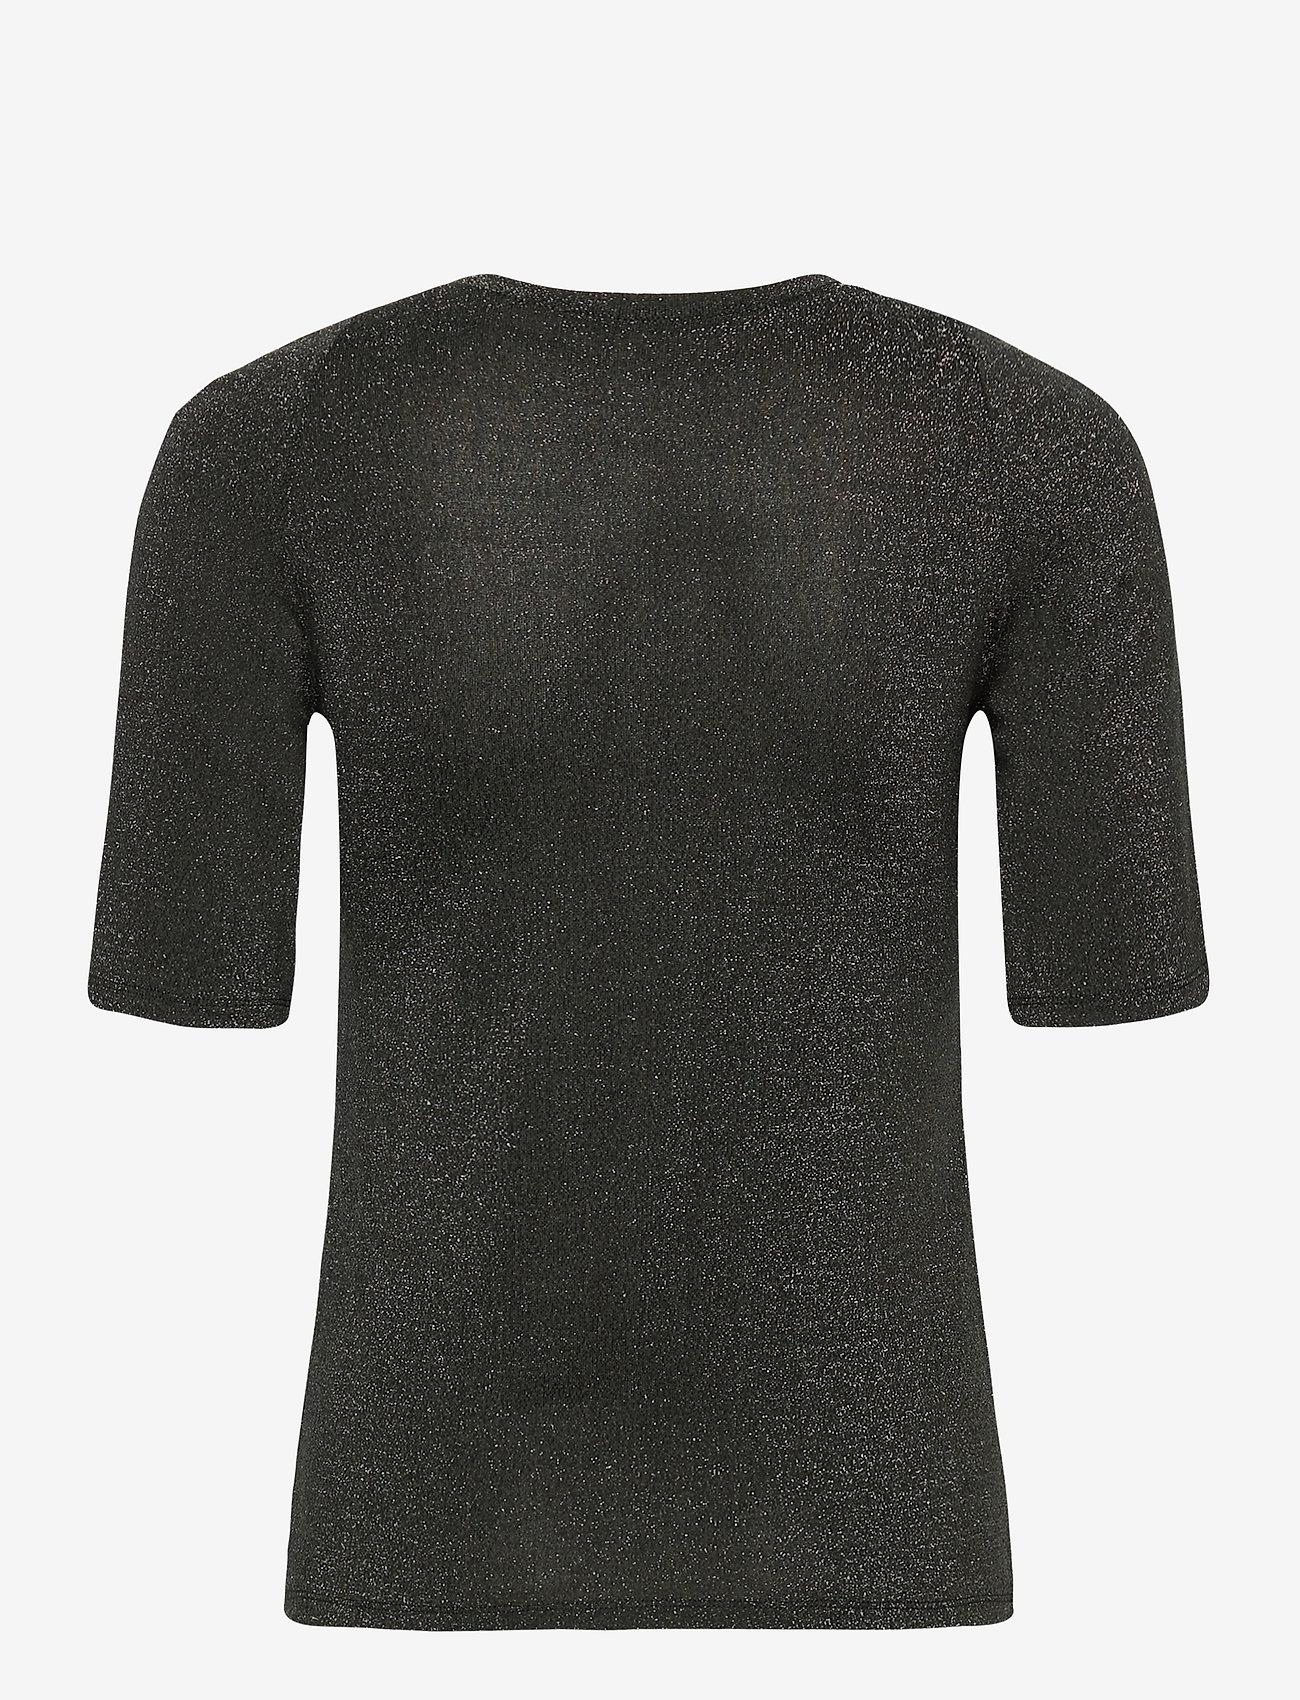 Tiger of Sweden - UBA - t-shirts - black green - 1